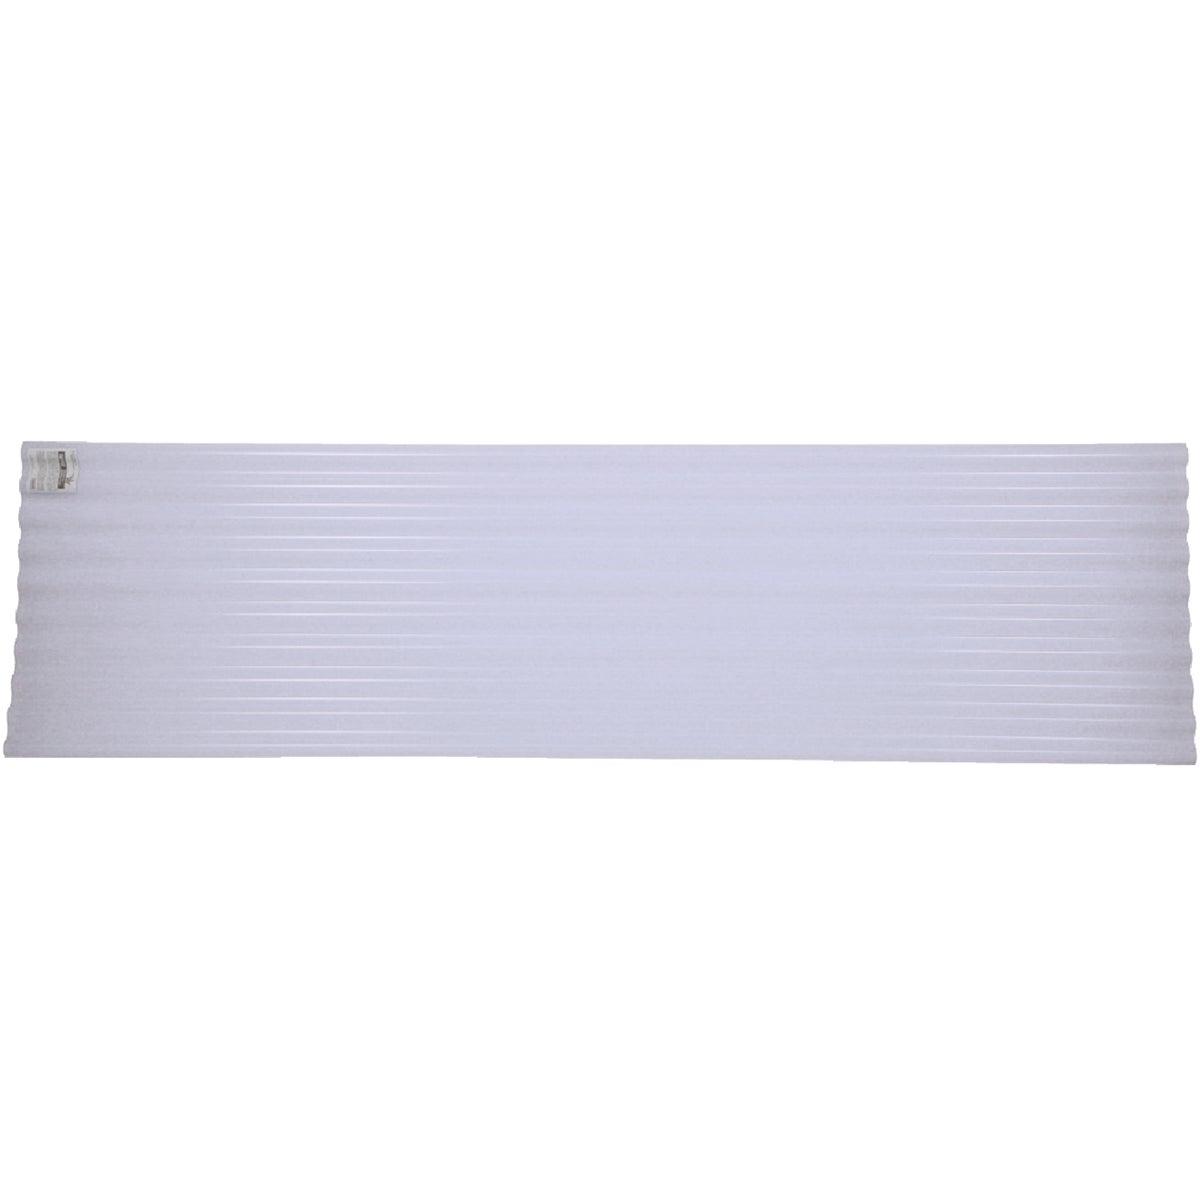 8' CLR CORGTD PVC PANEL